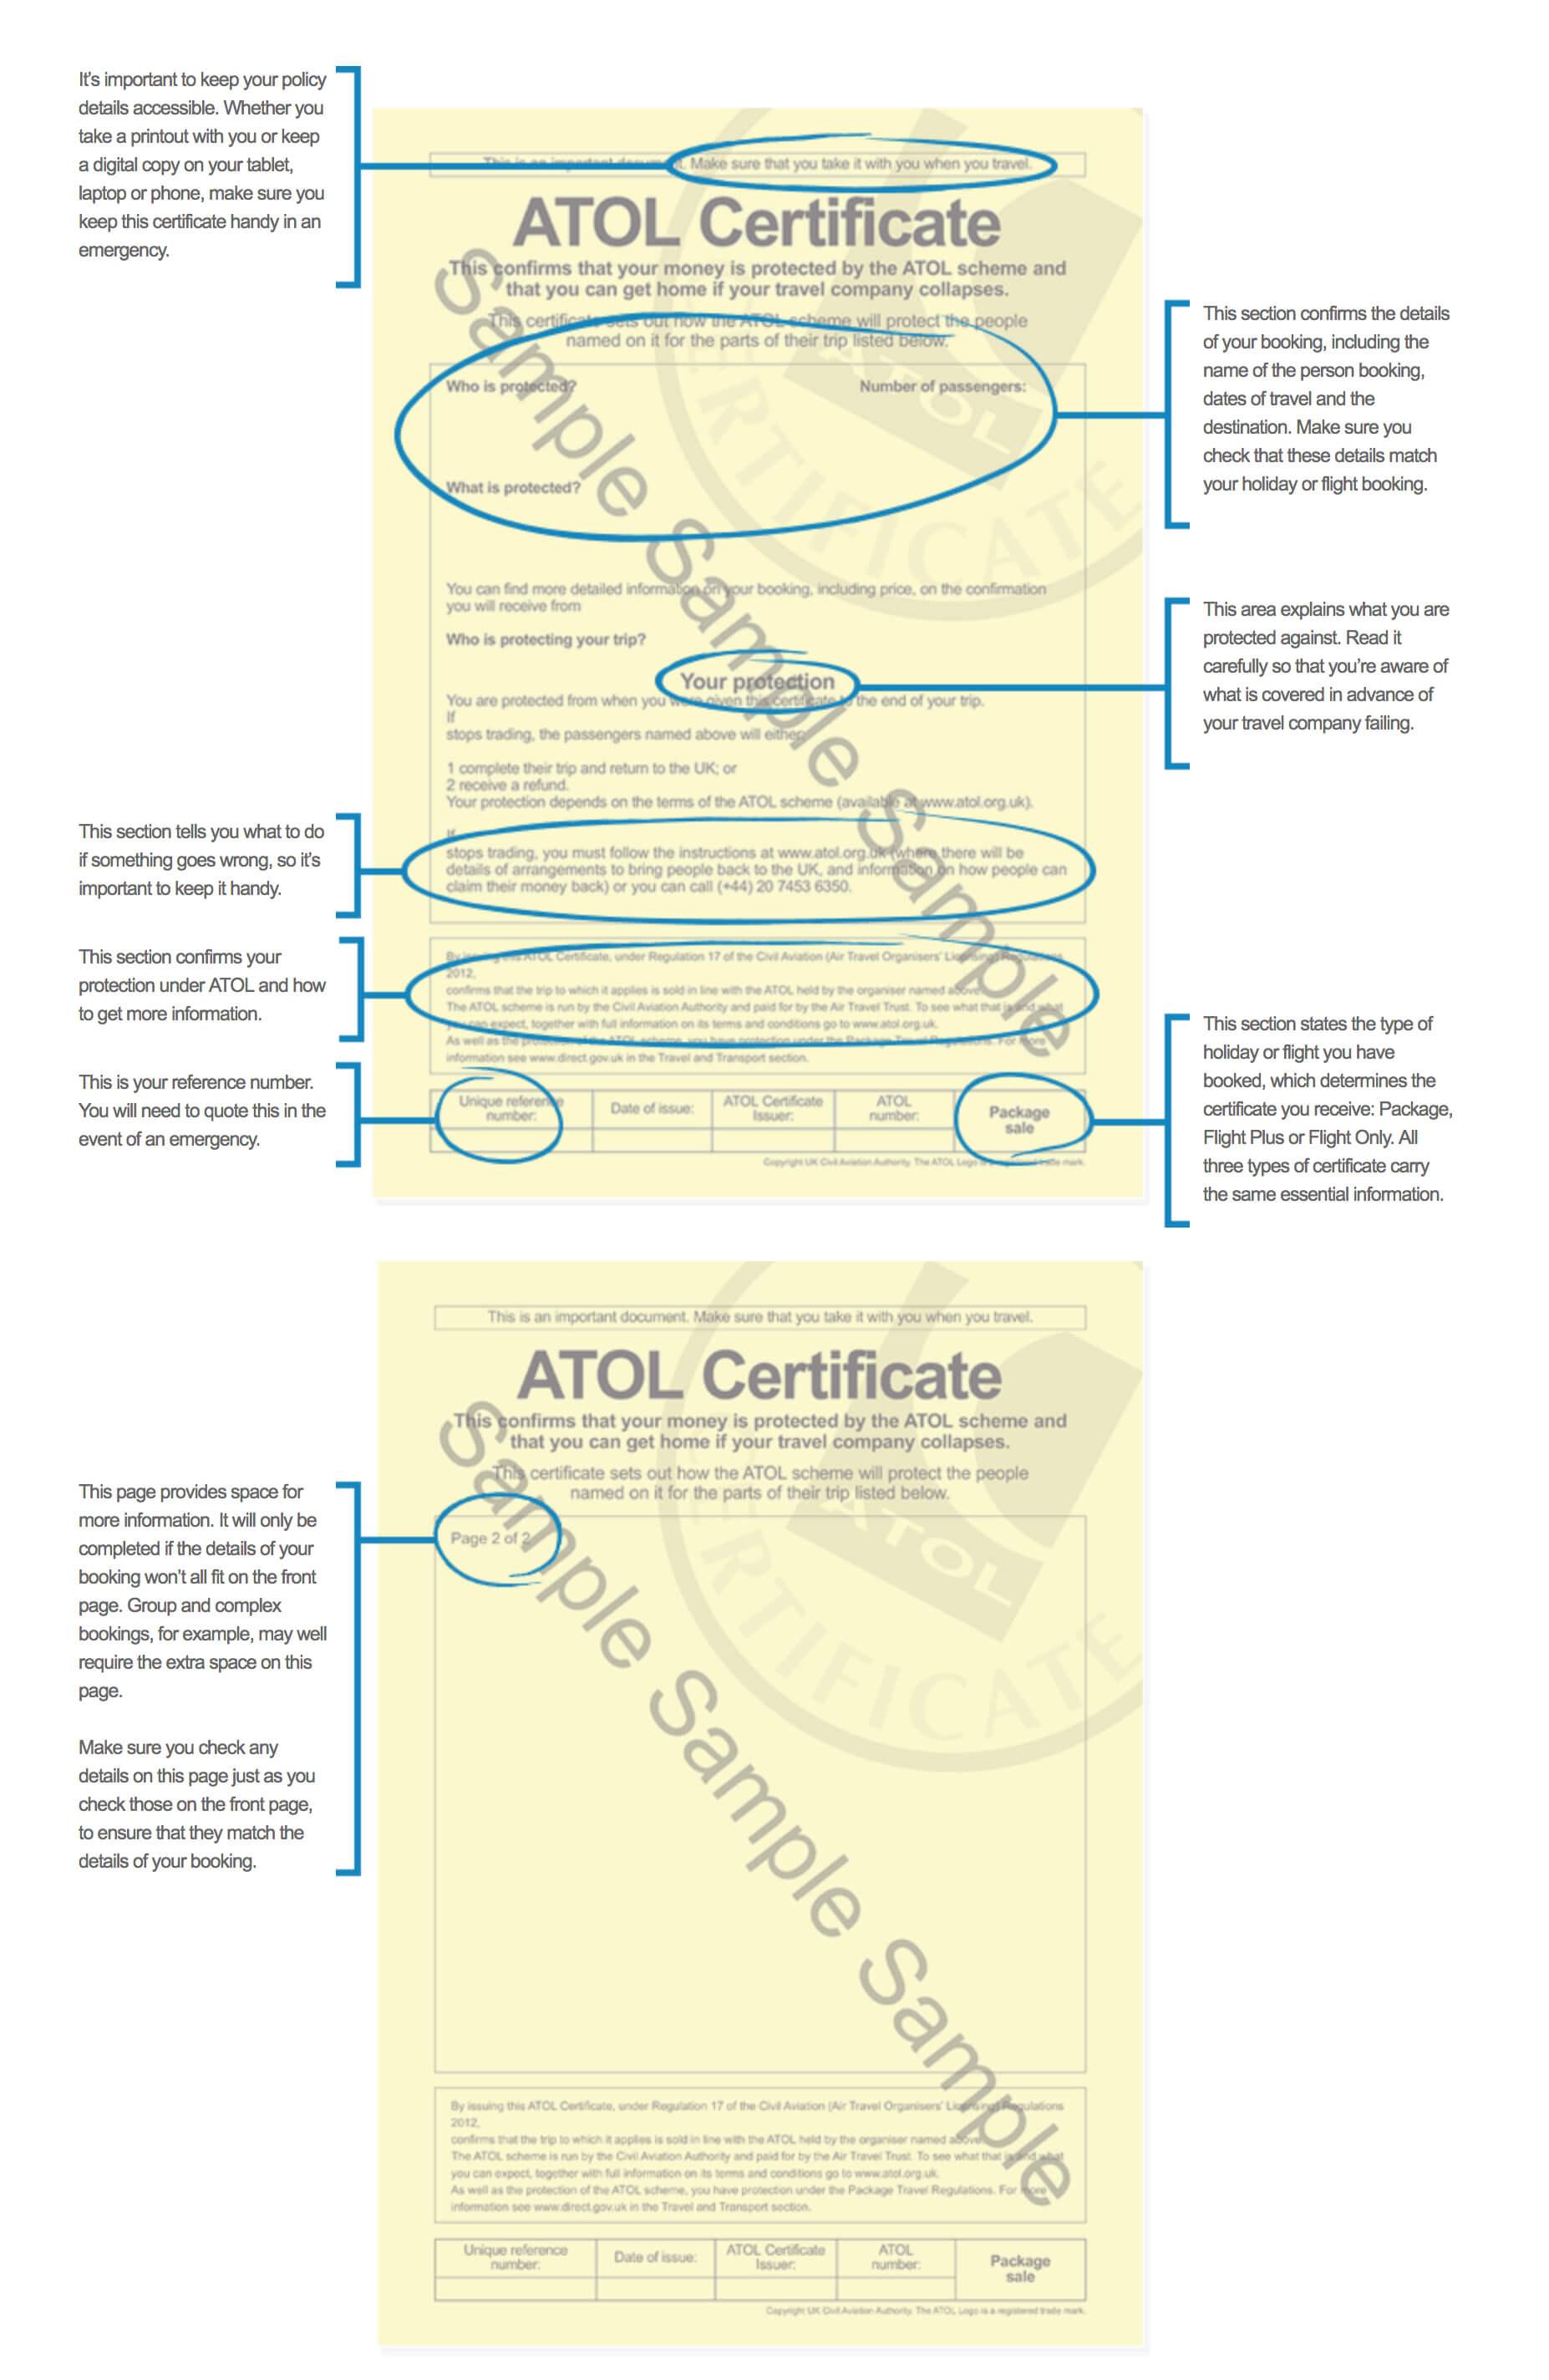 atol certifcate